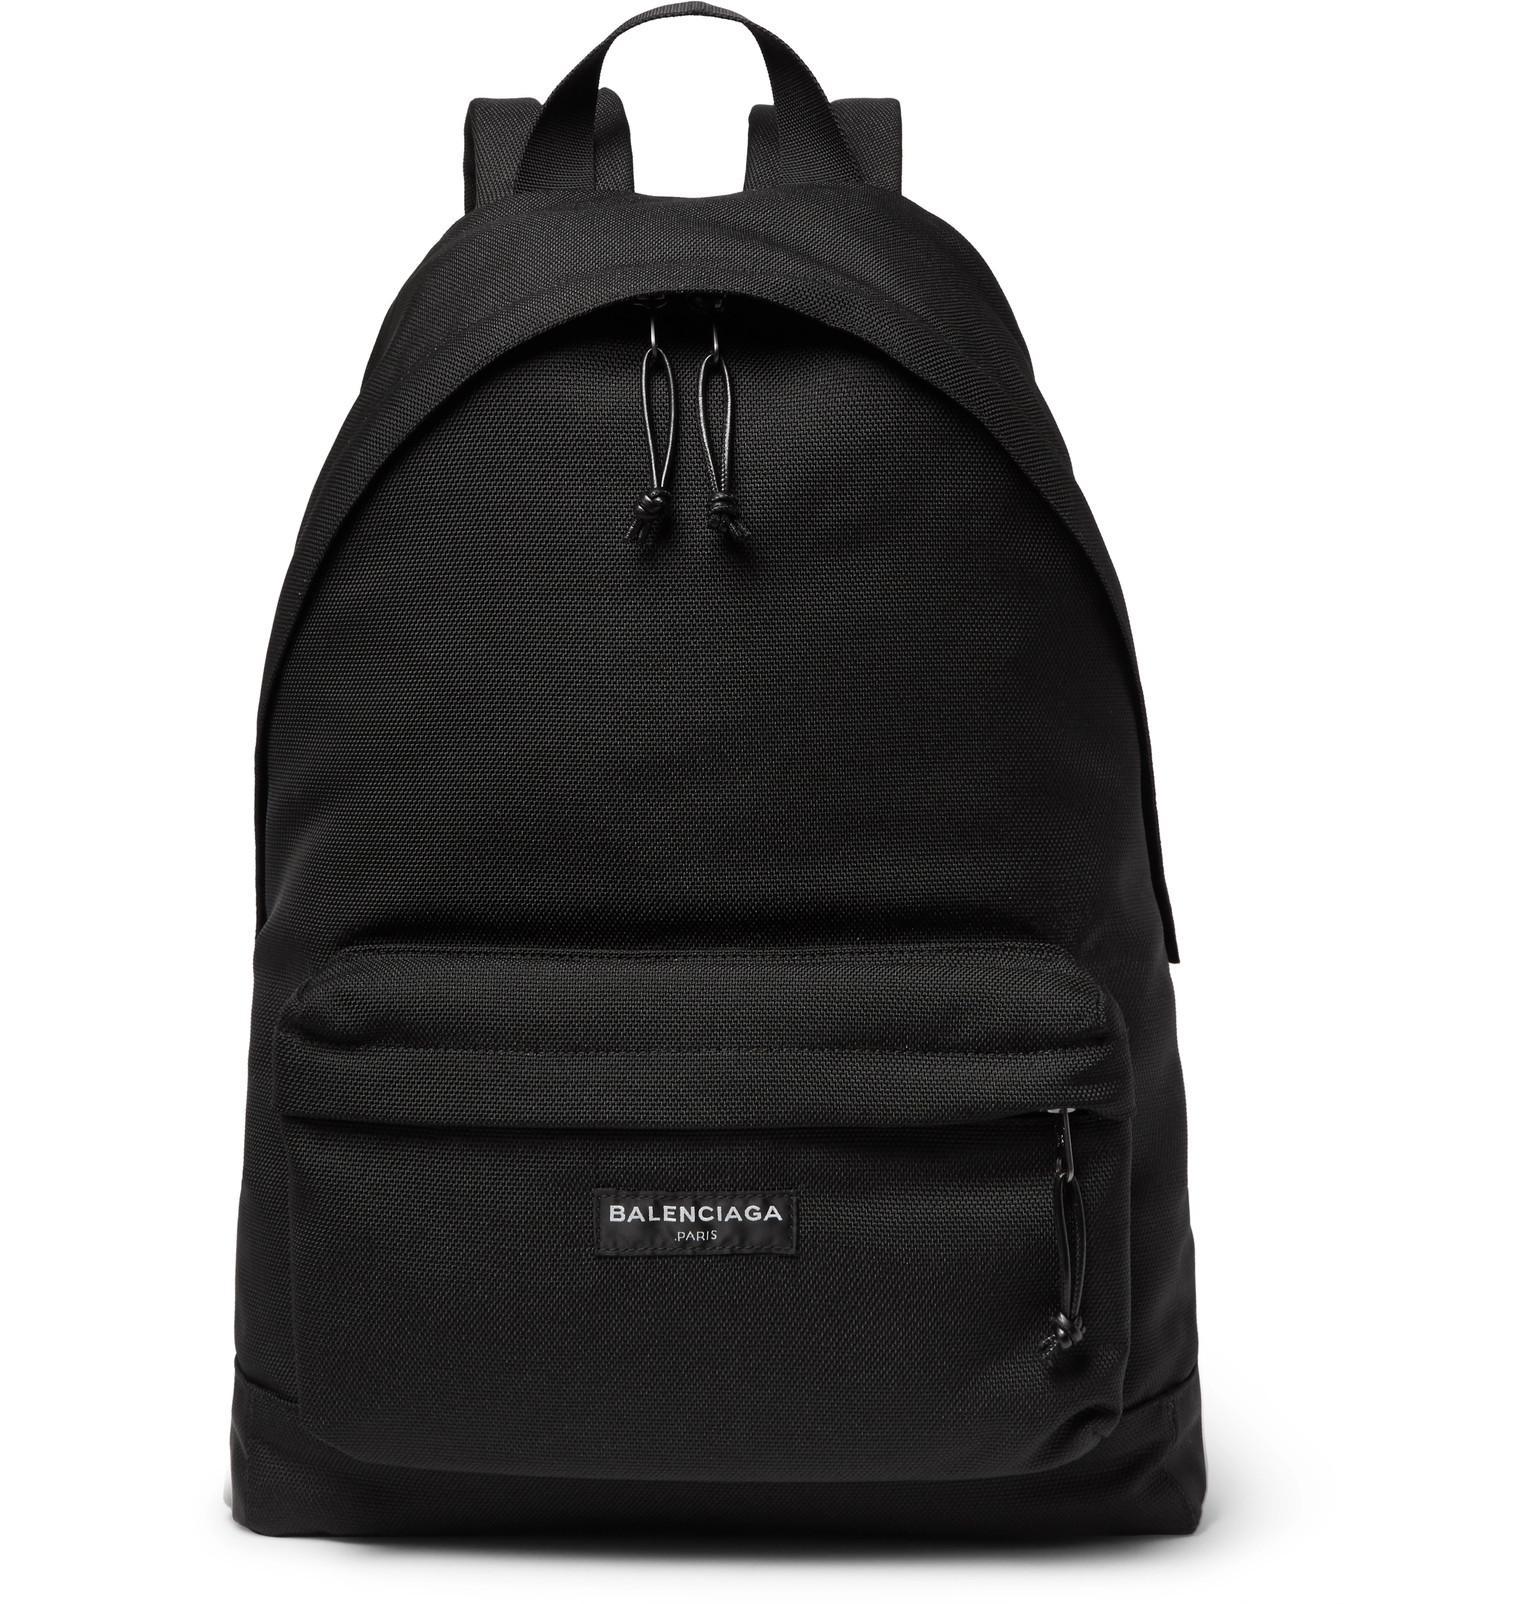 Balenciaga Explorer Nylon Backpack in Black for Men